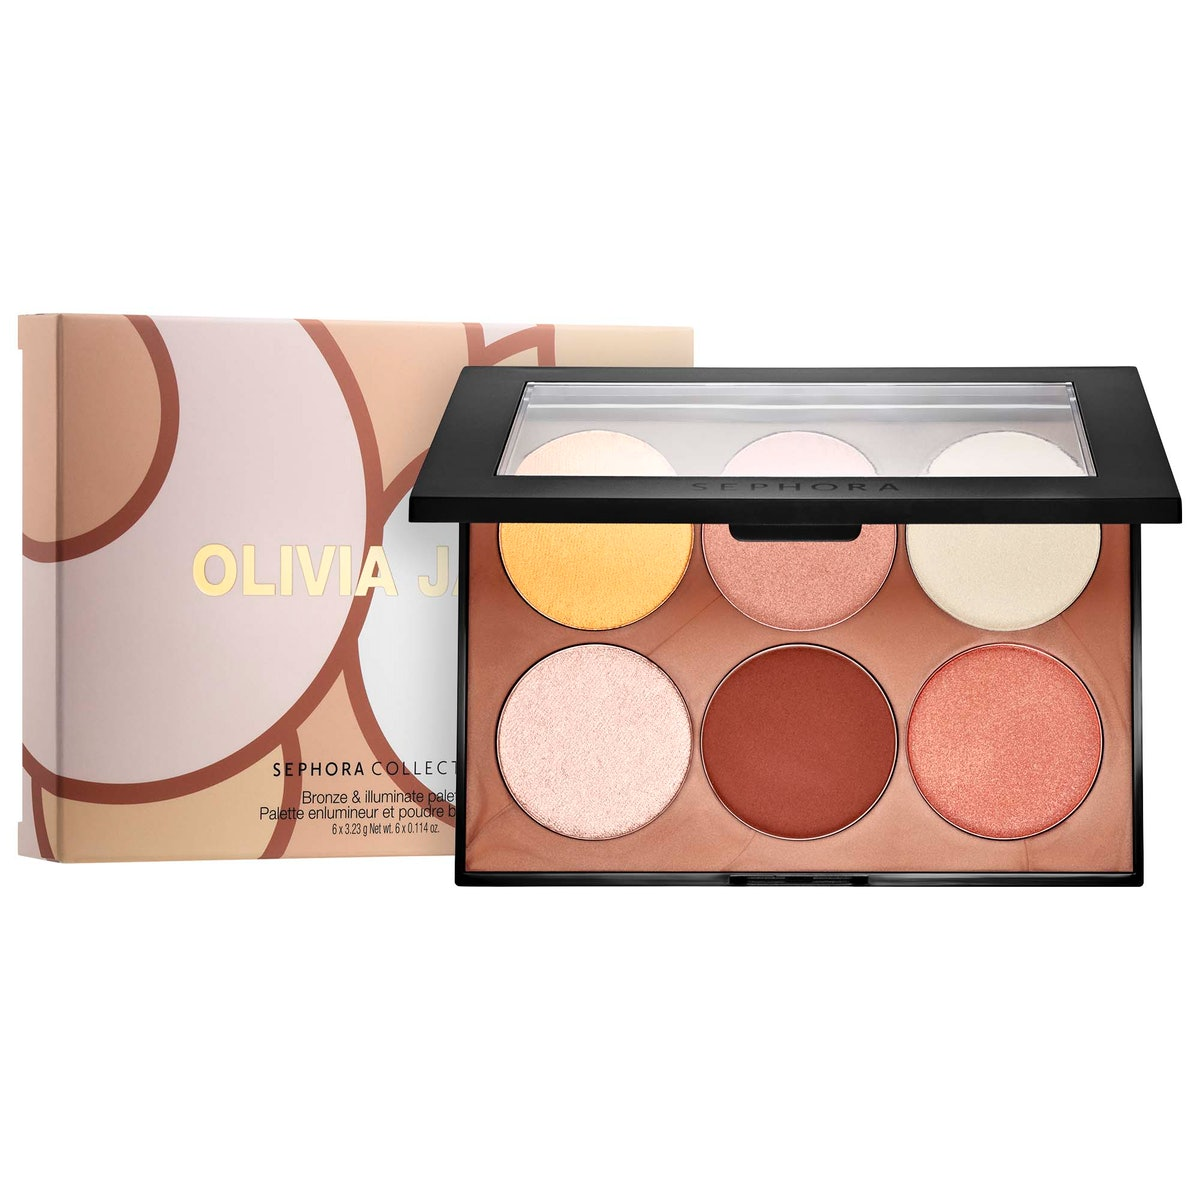 Olivia Jade x Sephora Collection Bronze & Illuminate Palette